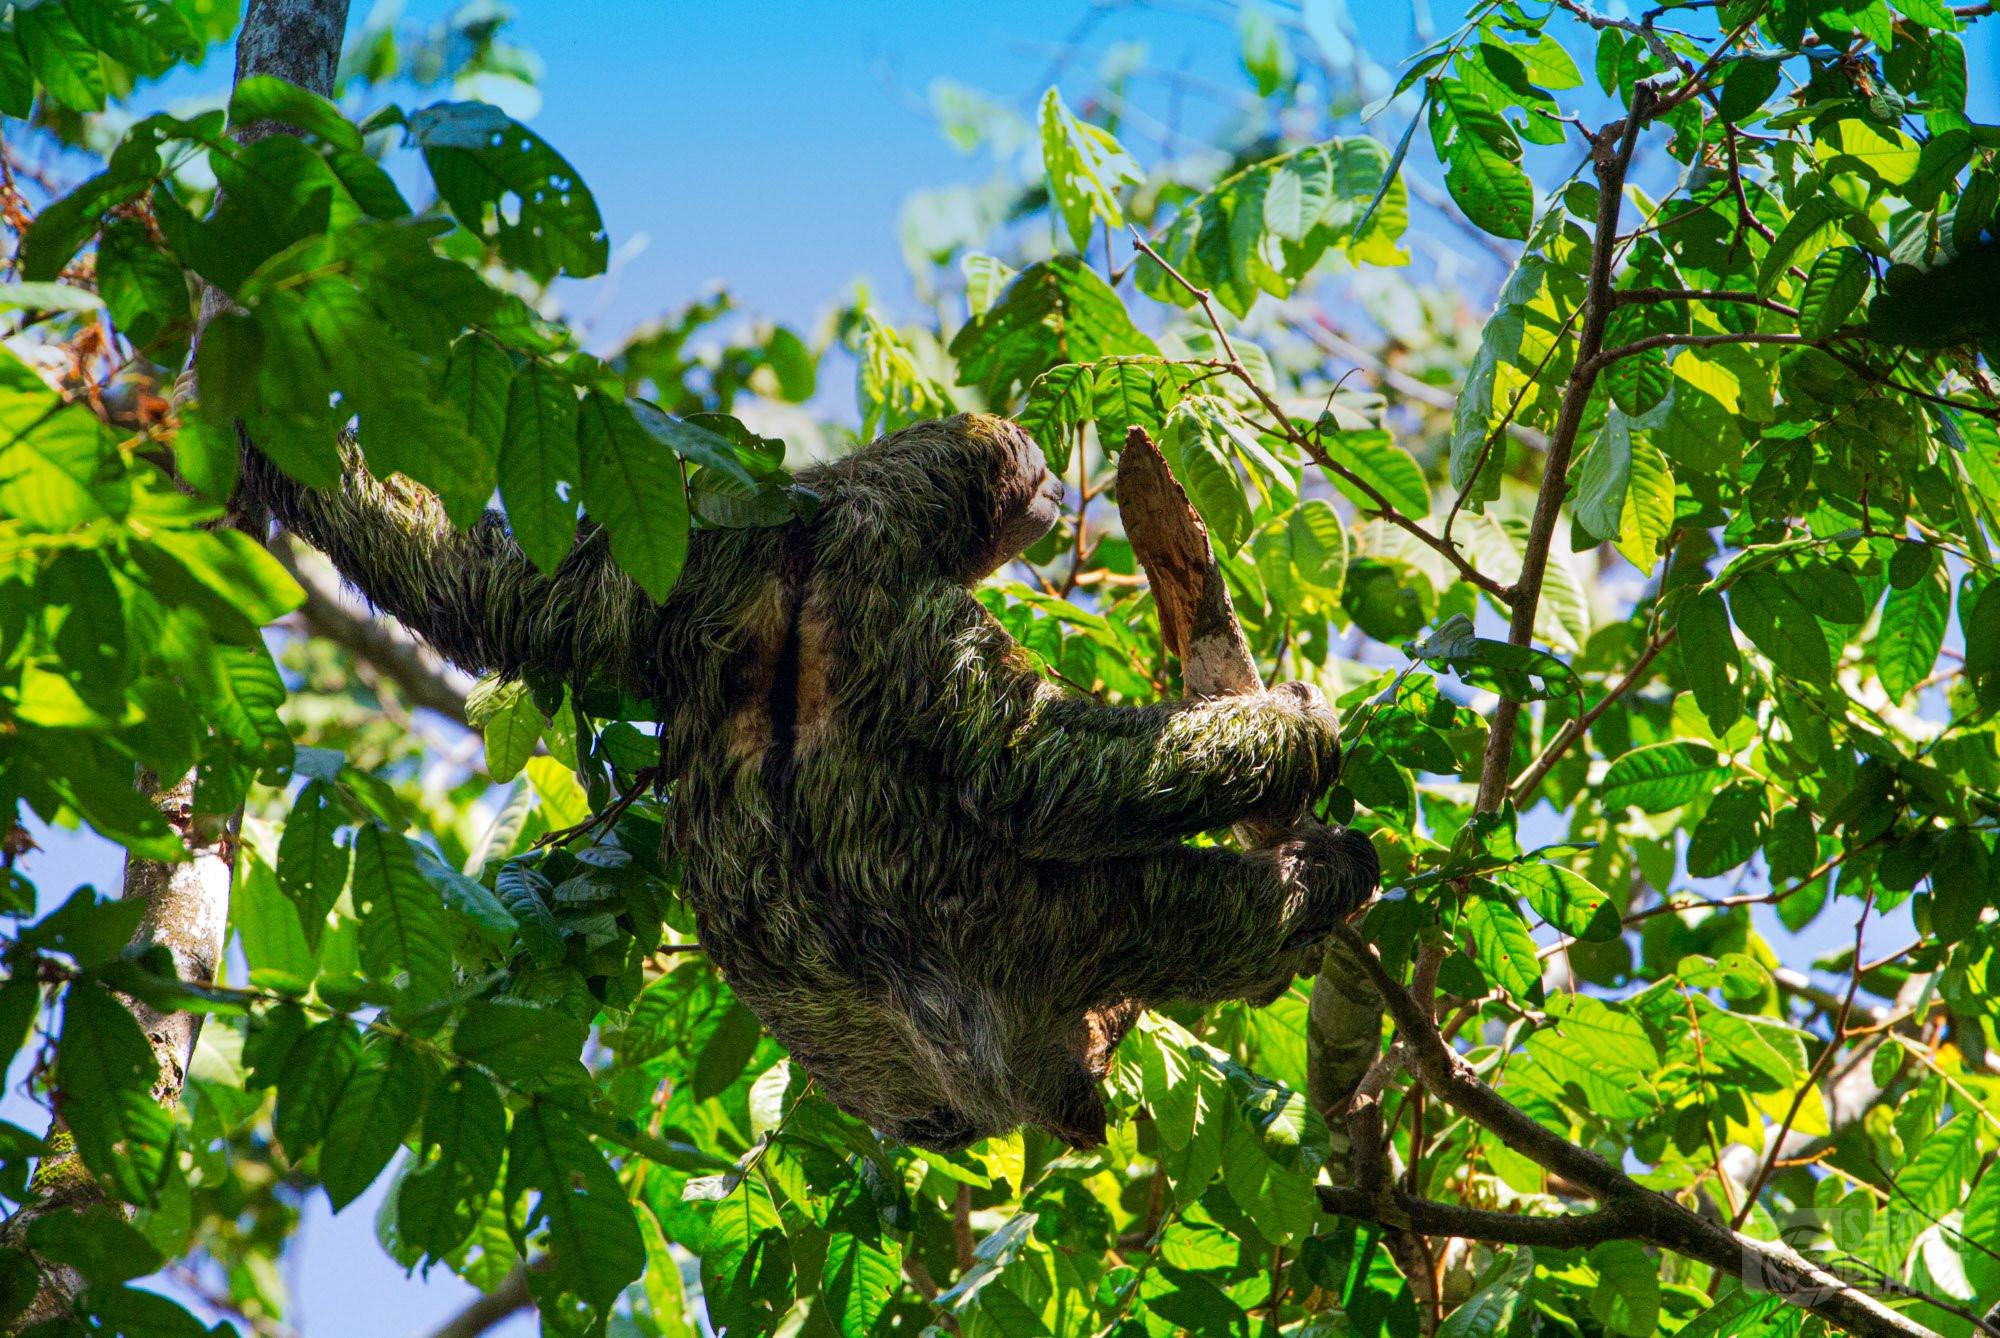 Brown-throated sloth, Manuel Antonio Park, Costa Rica